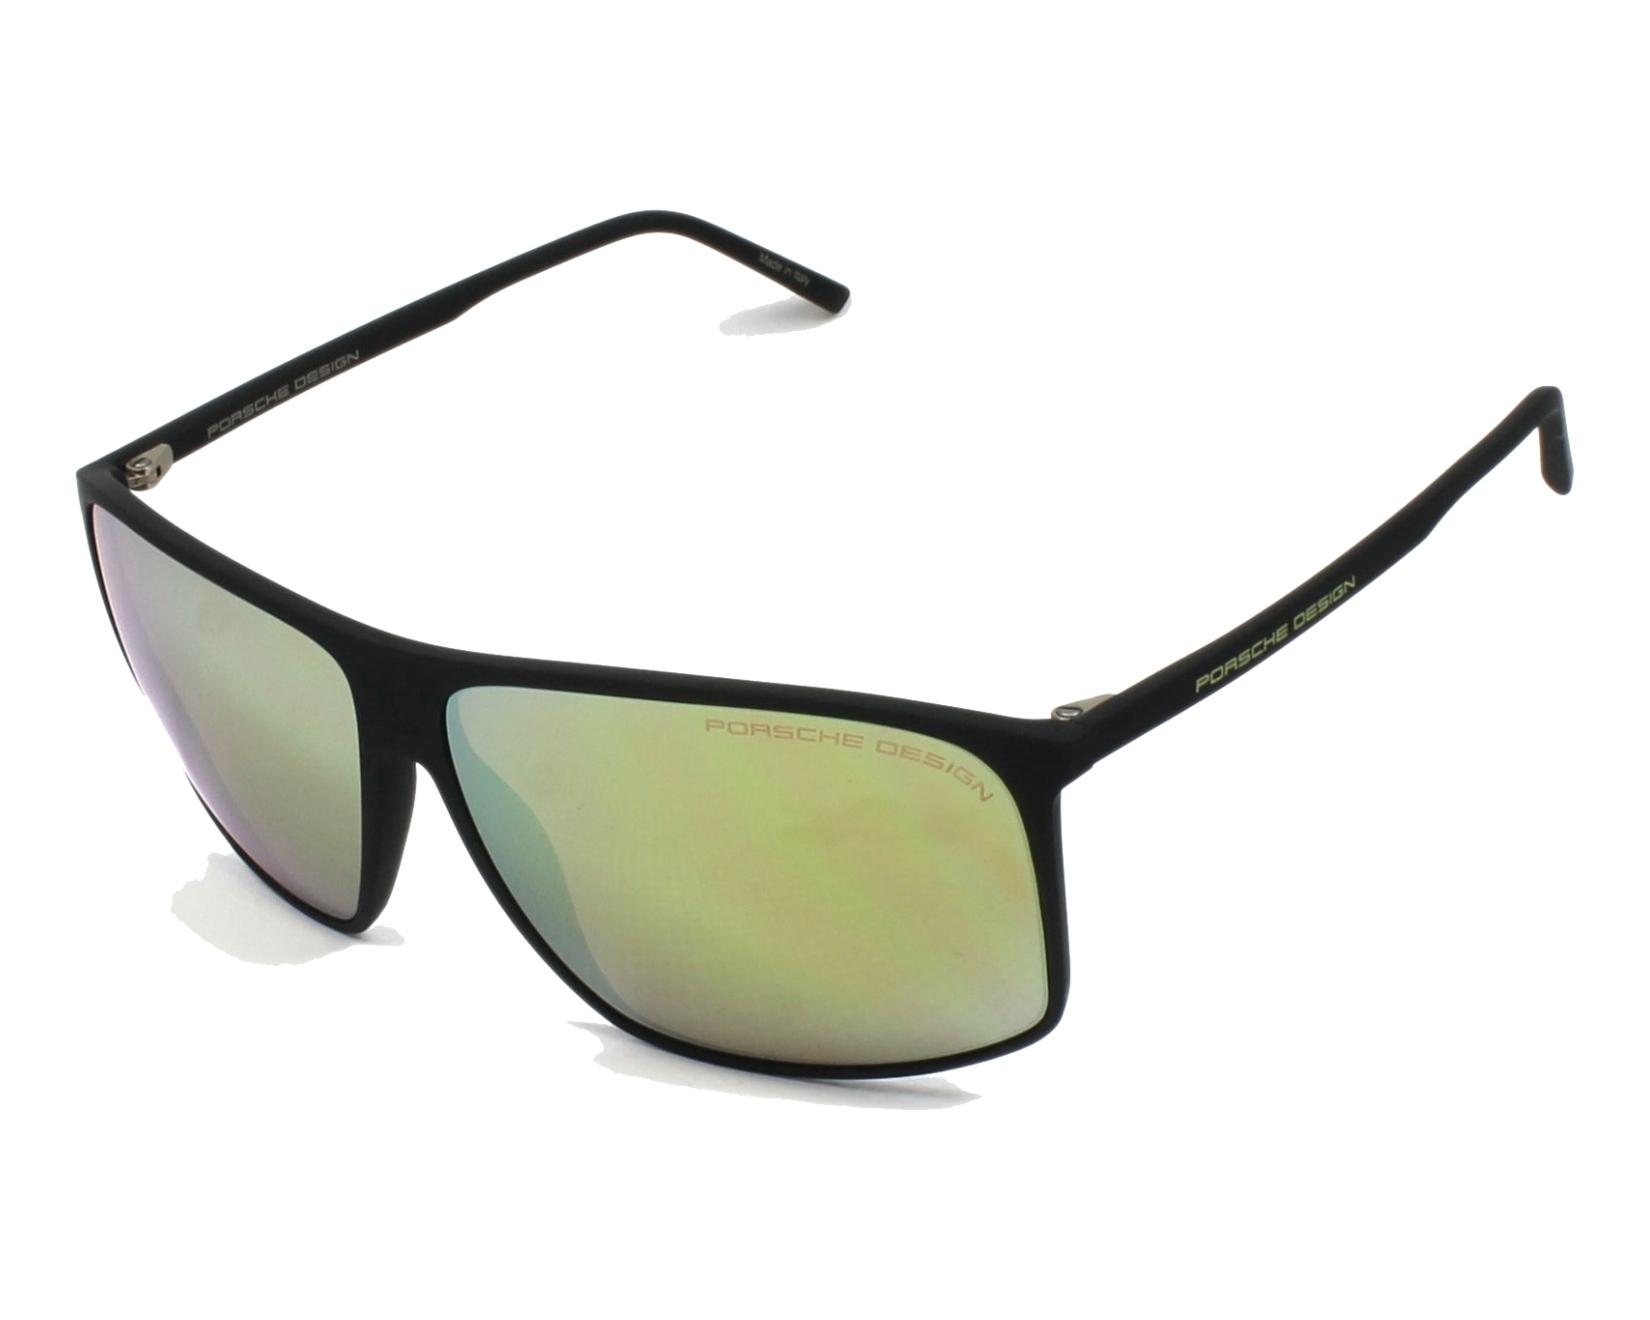 porsche design sunglasses p-8594 a